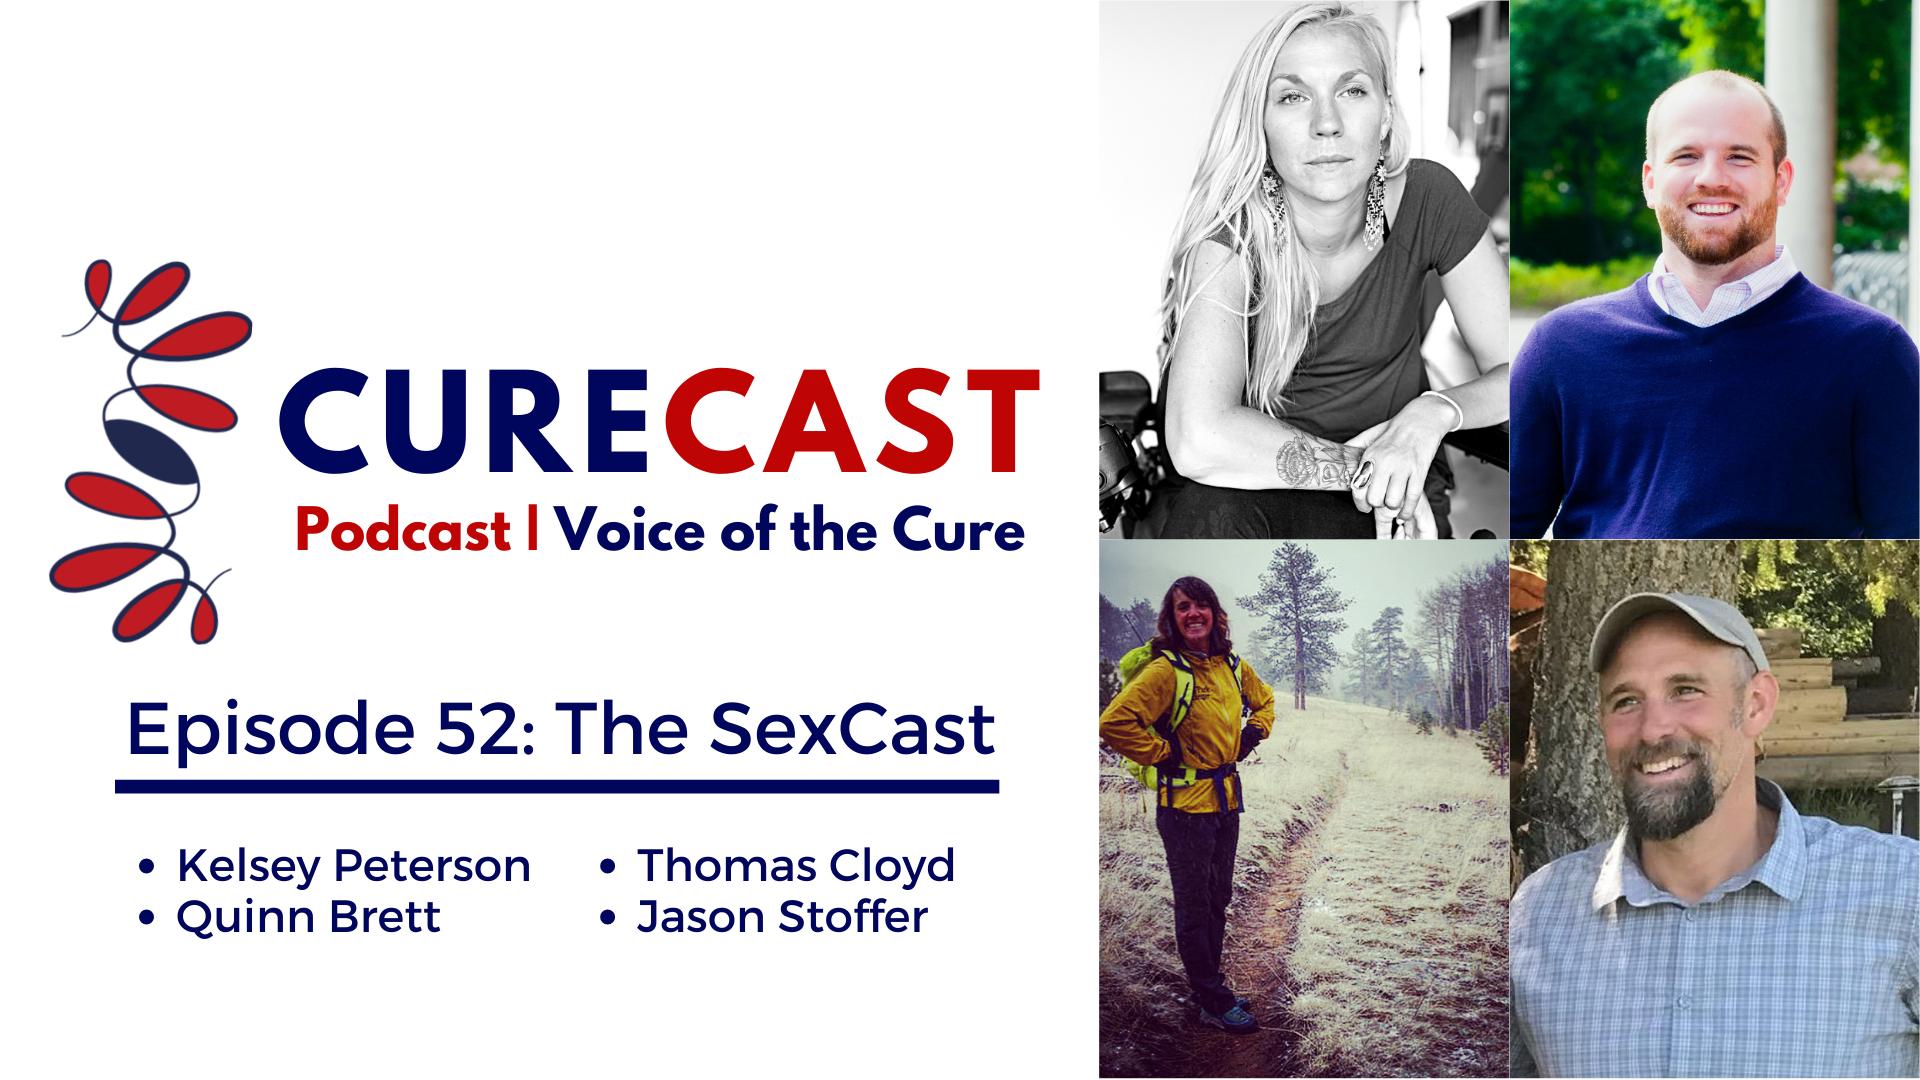 CureCast Episode 52: The SexCast